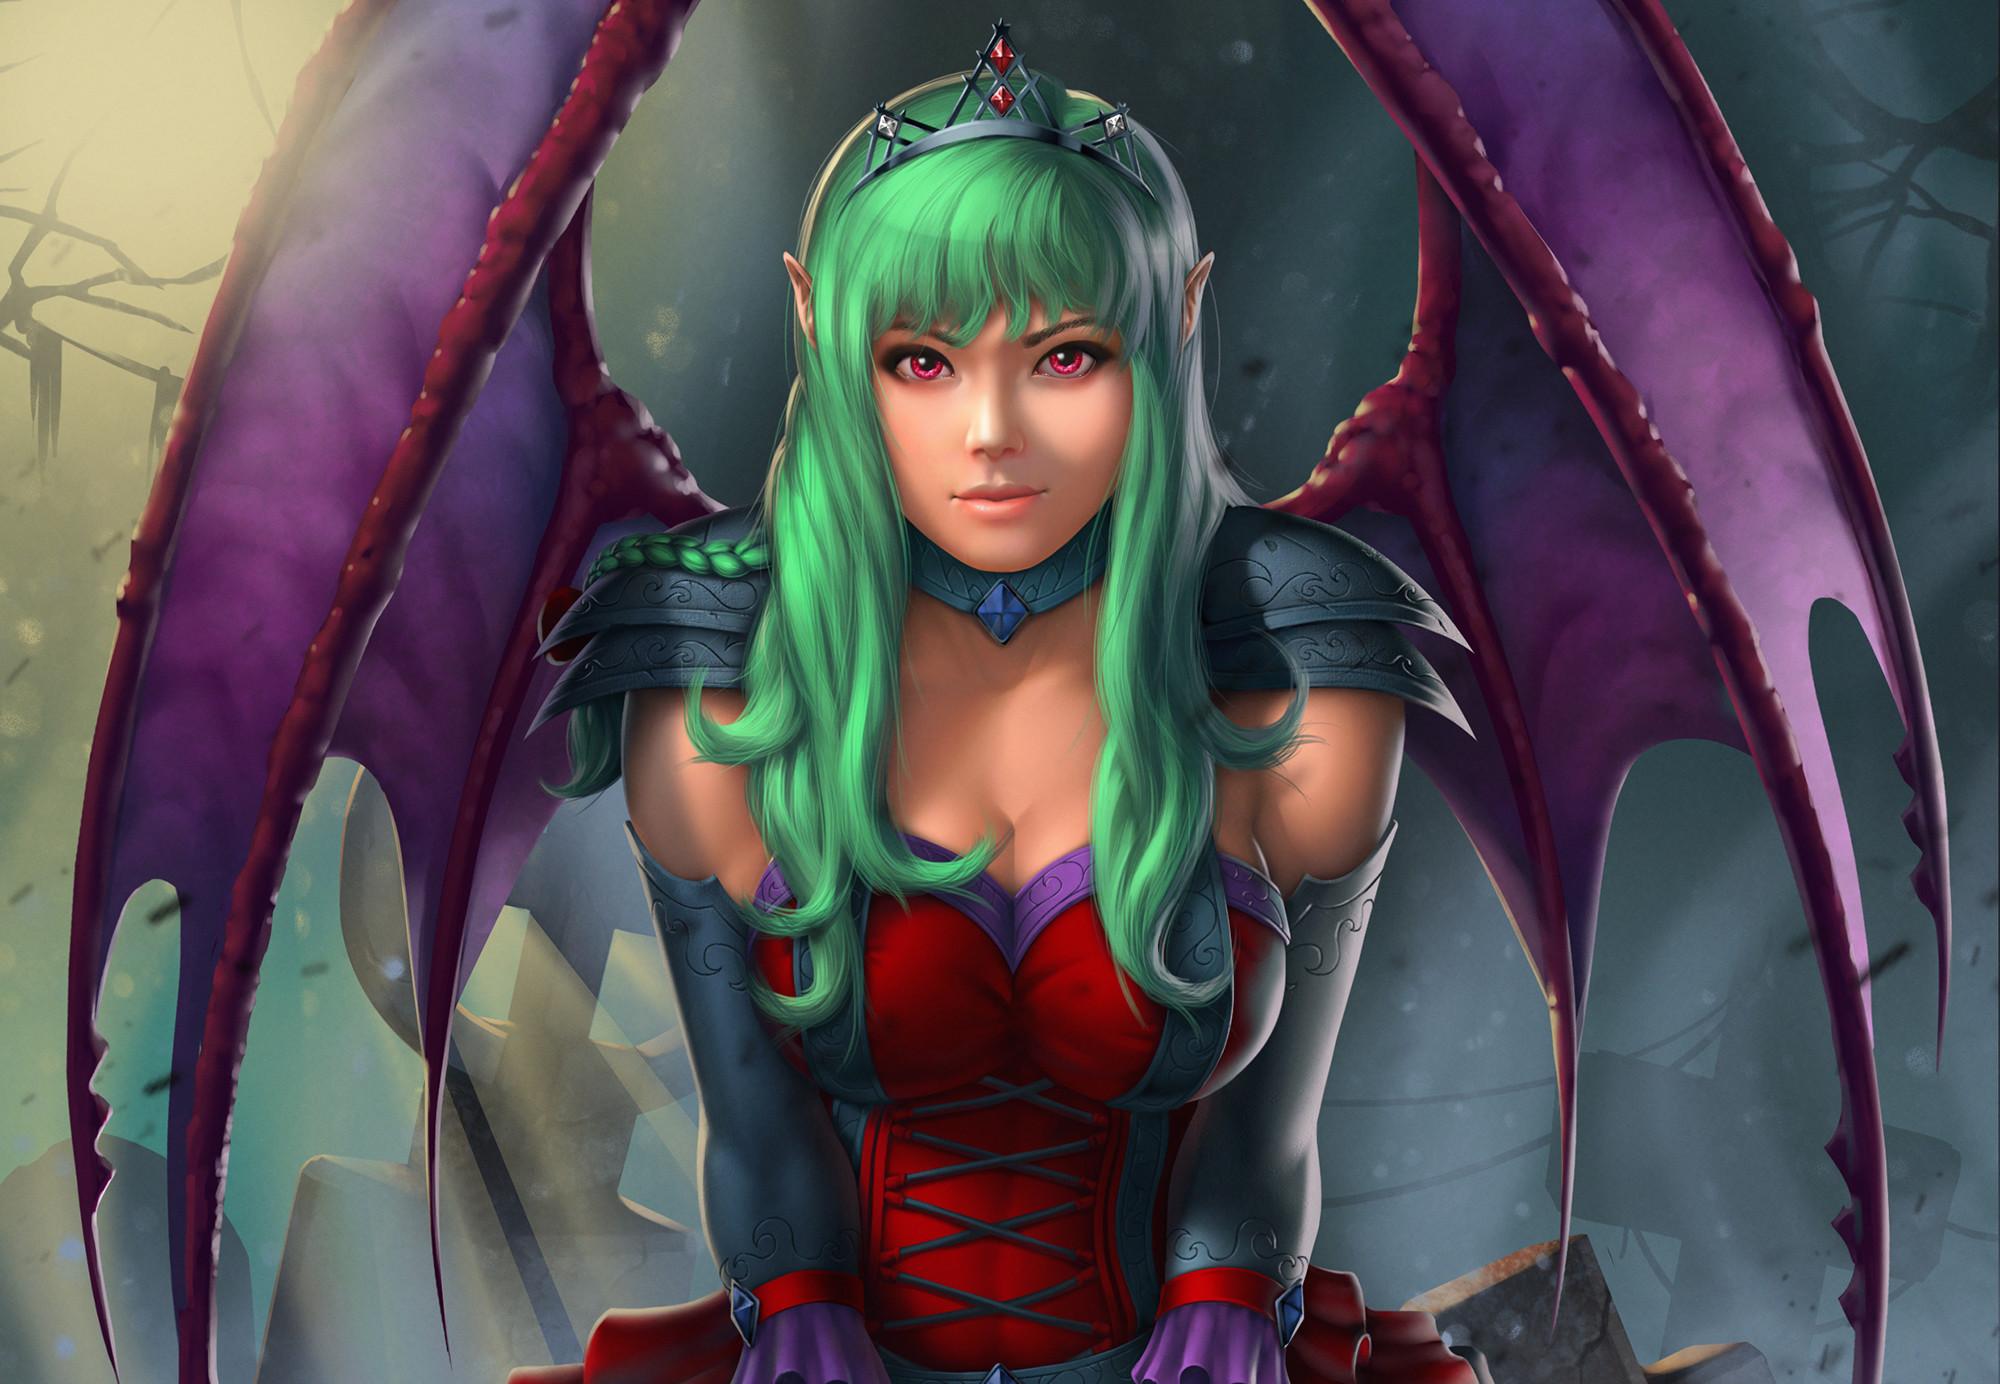 Res: 2000x1384, Fantasy Demon Girl